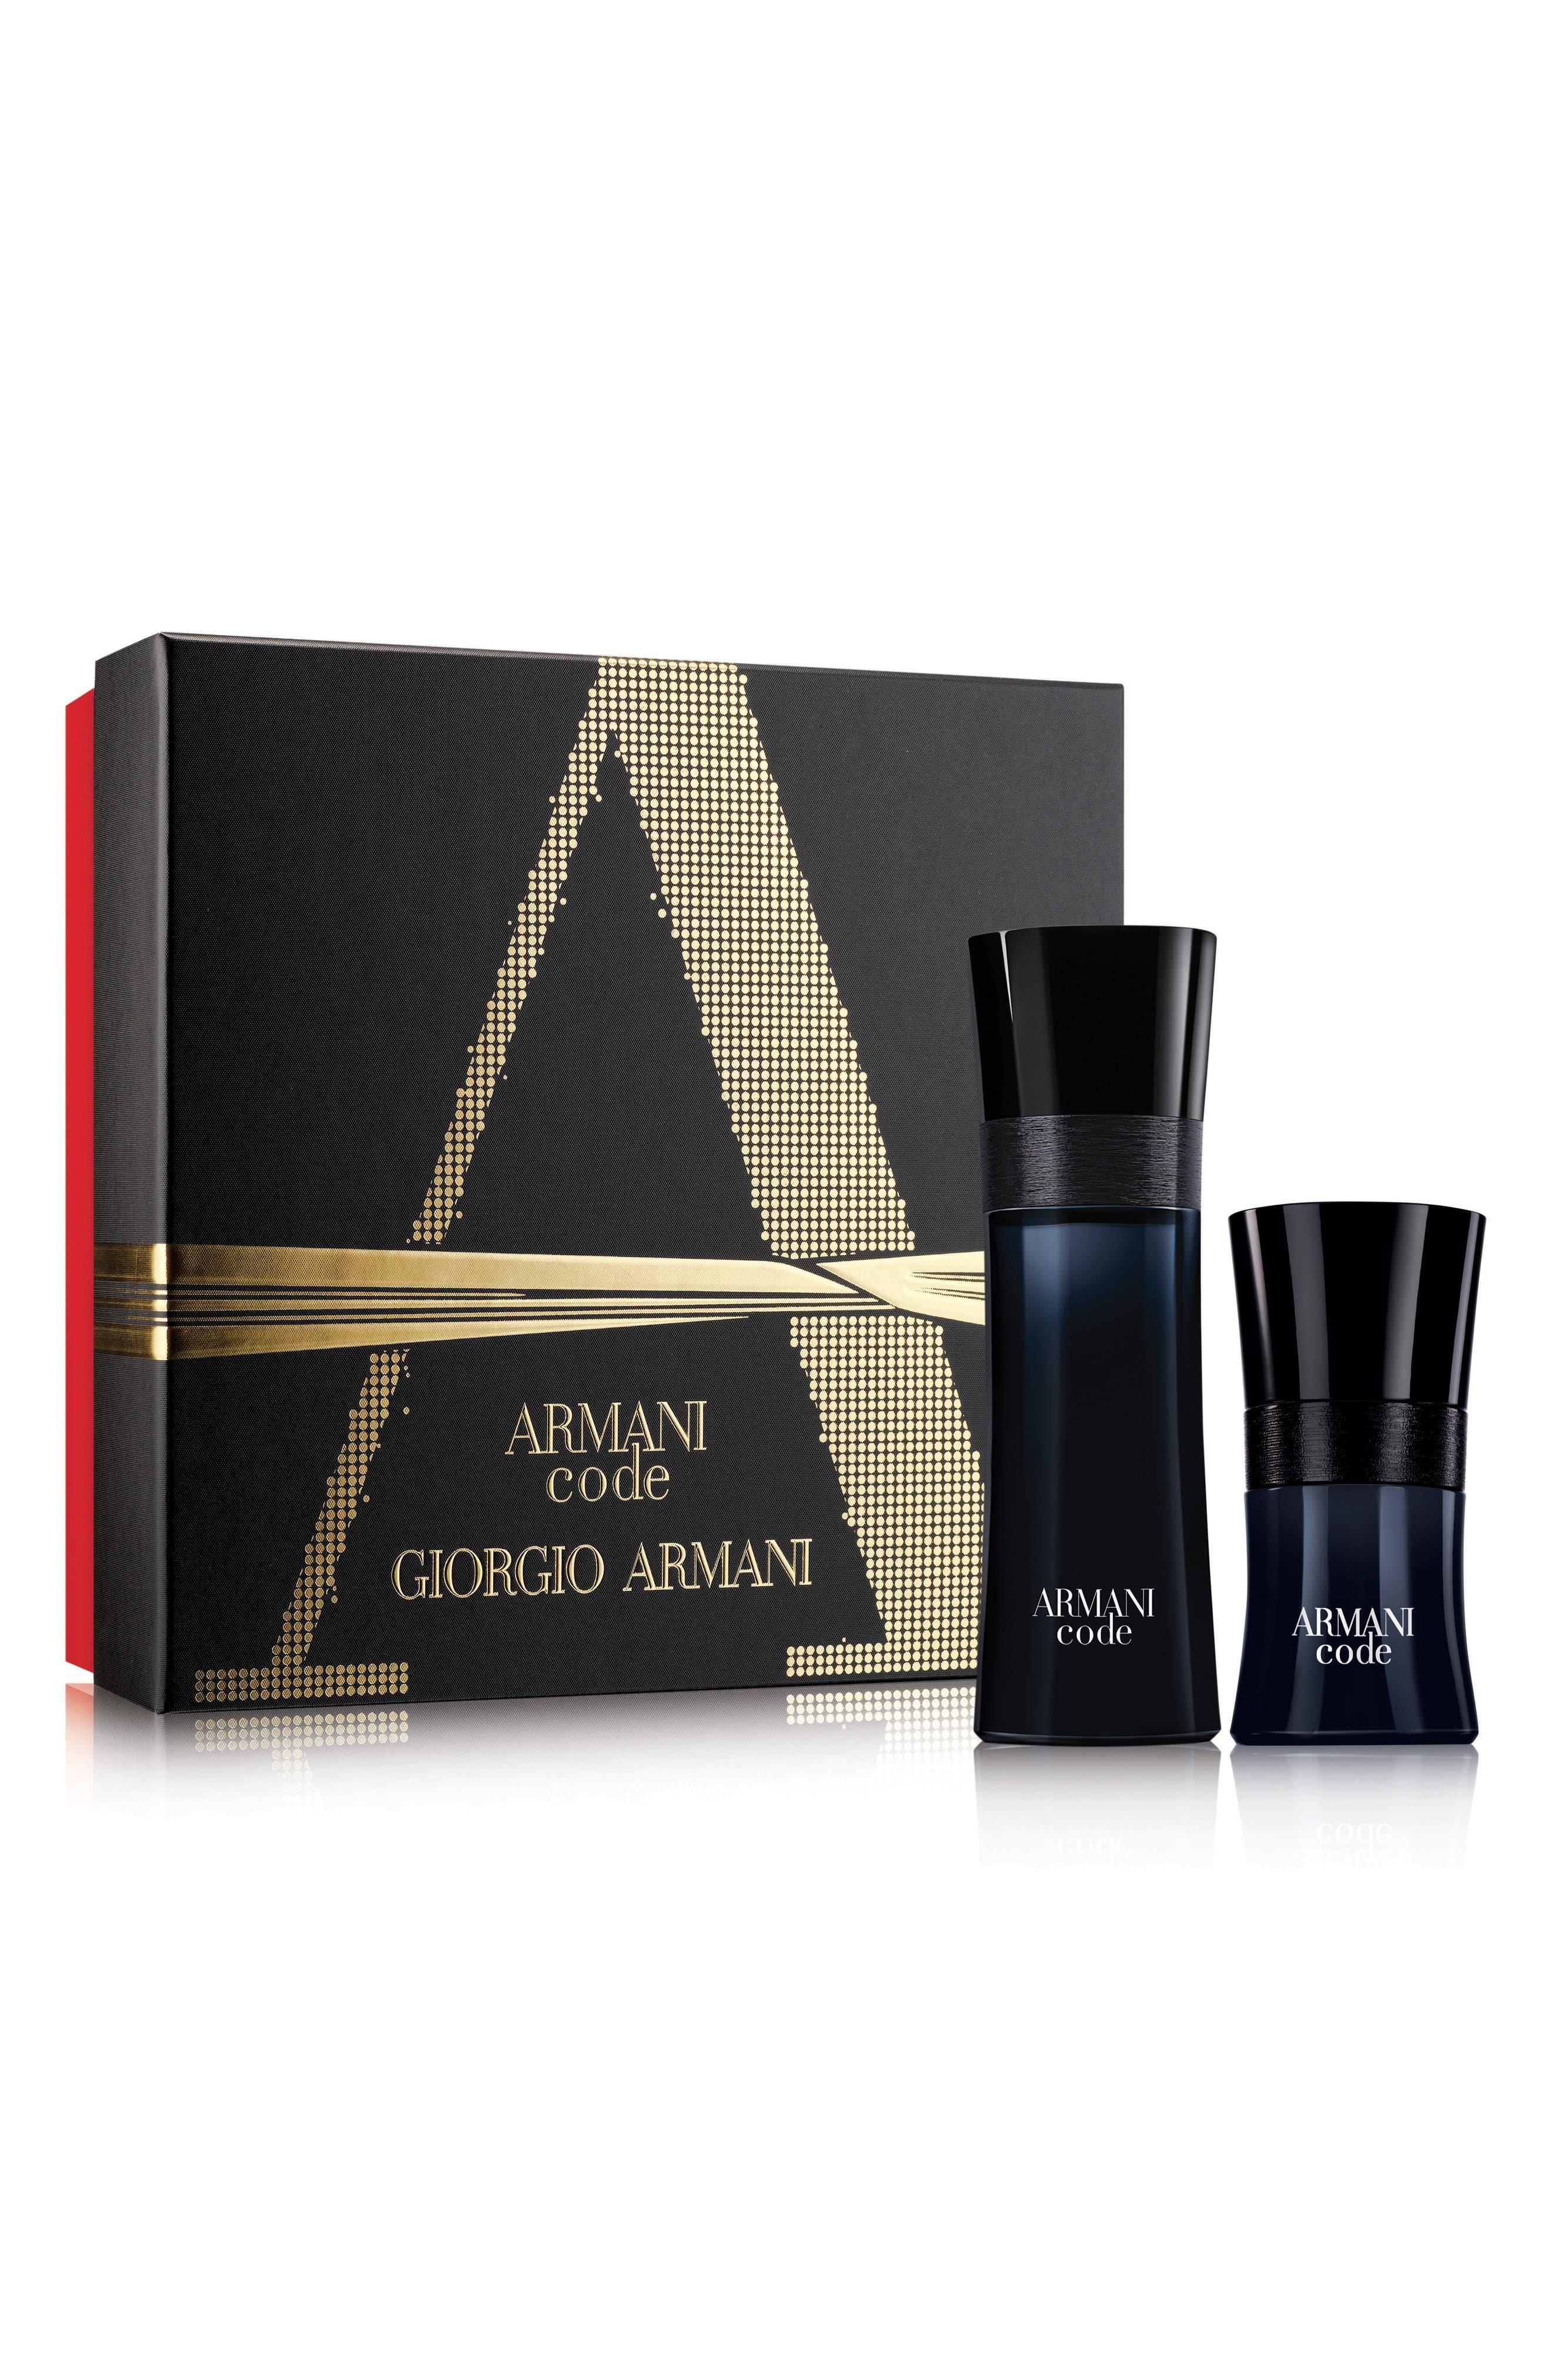 Alternate Image 1 Selected - Armani Code Eau de Toilette Set ($130 Value)